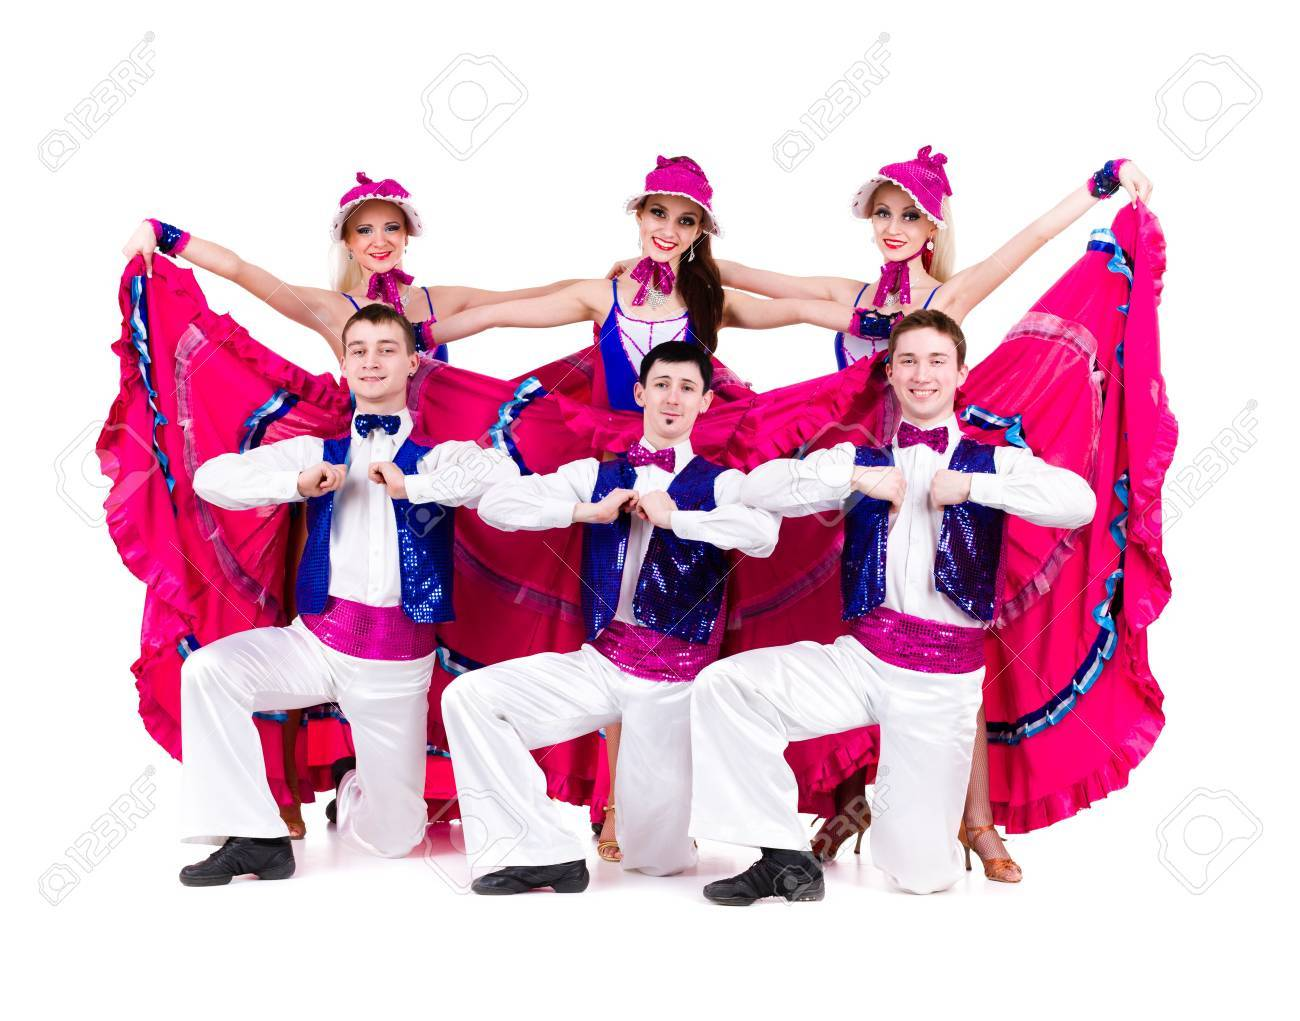 cabaret dancer team dancing   Isolated on white background in full length Stock Photo - 18657183